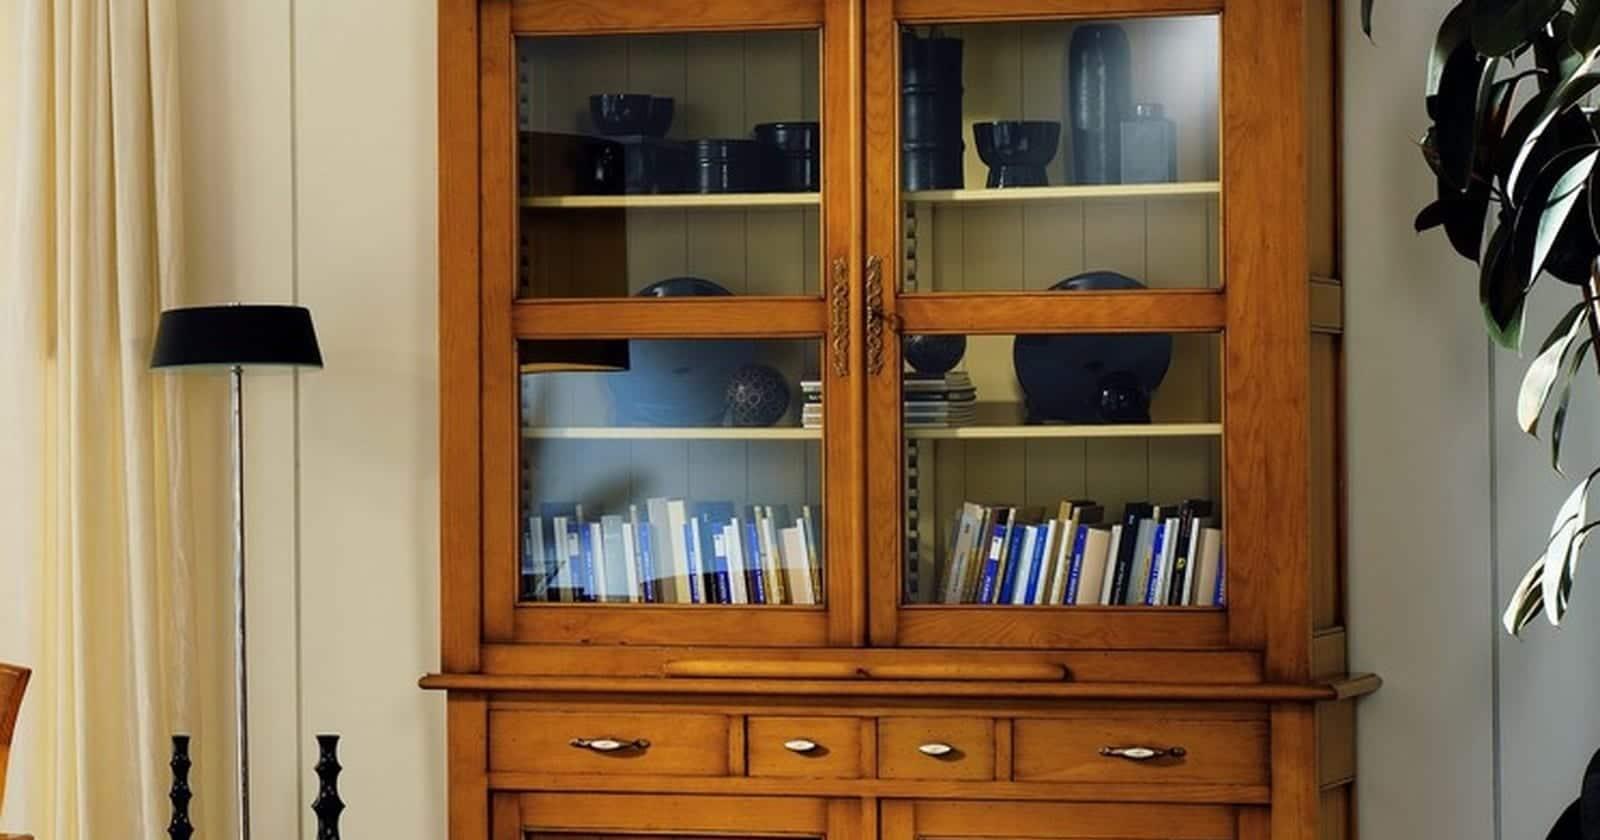 Consejos para limpiar tus muebles de madera maciza - Limpiar muebles madera ...